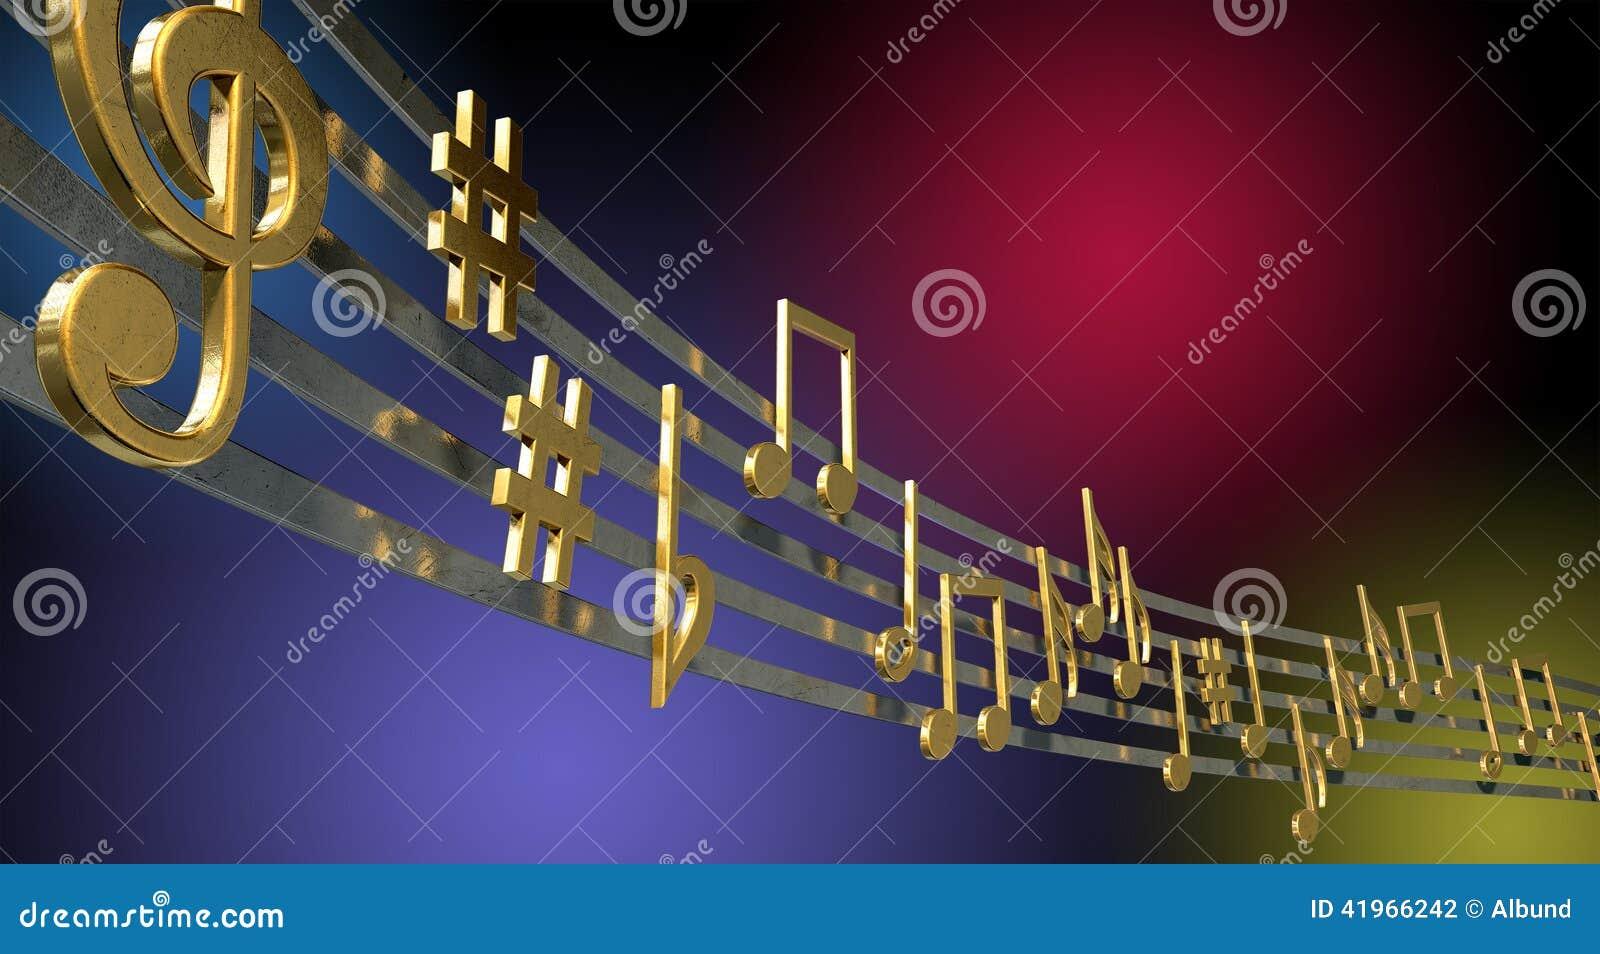 White music note icon